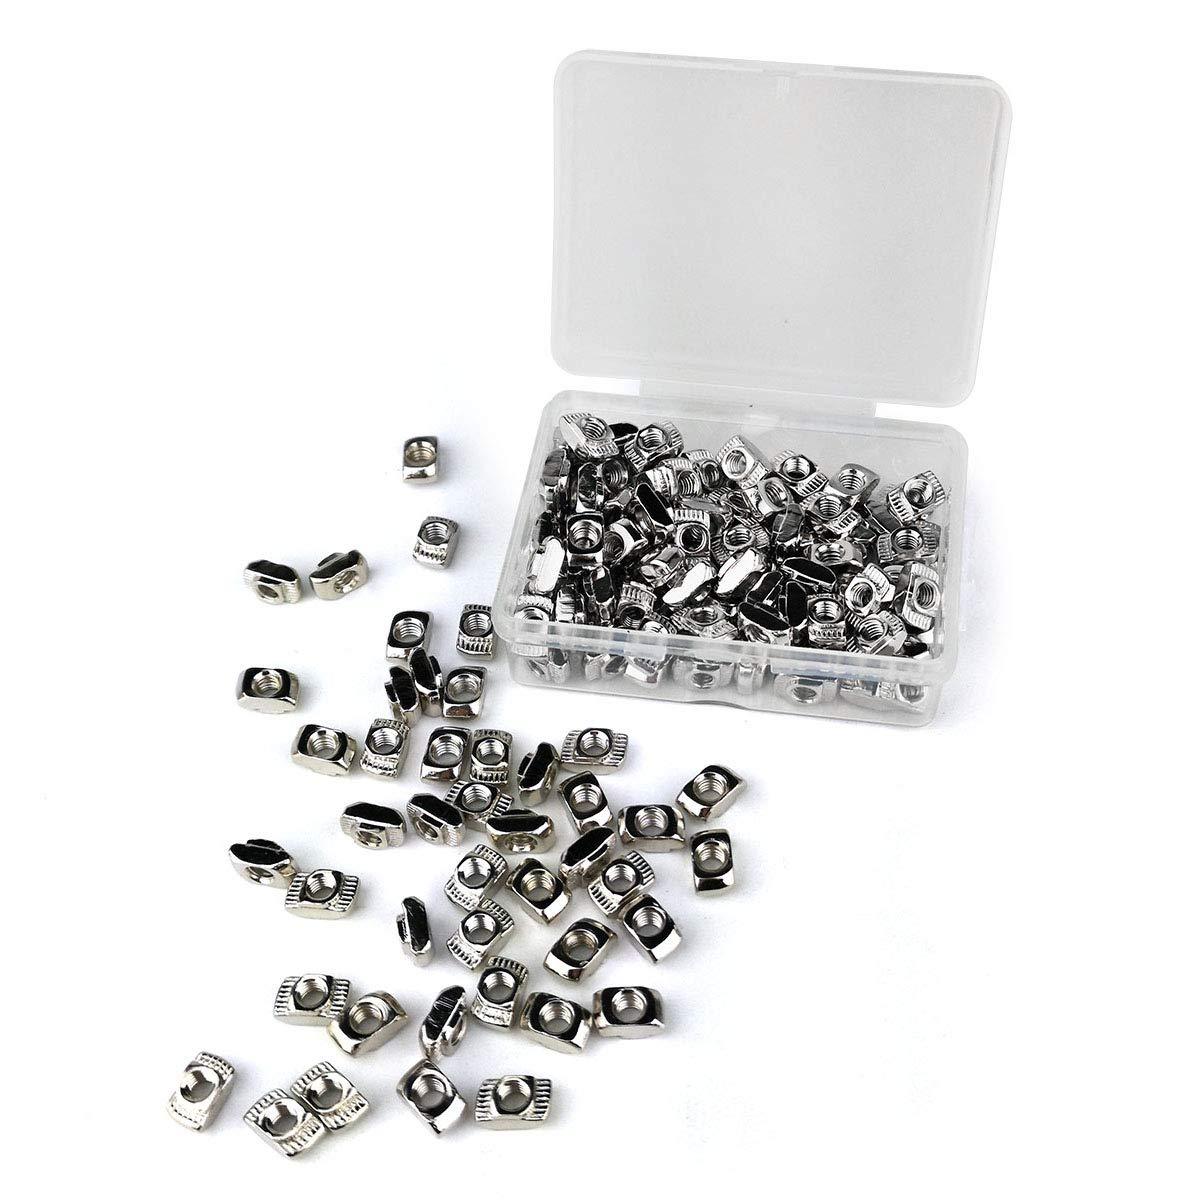 2020 Series T Slot Nut Fastener Nut for T Slot Aluminum Profile 150 Pcs M4 T Nuts